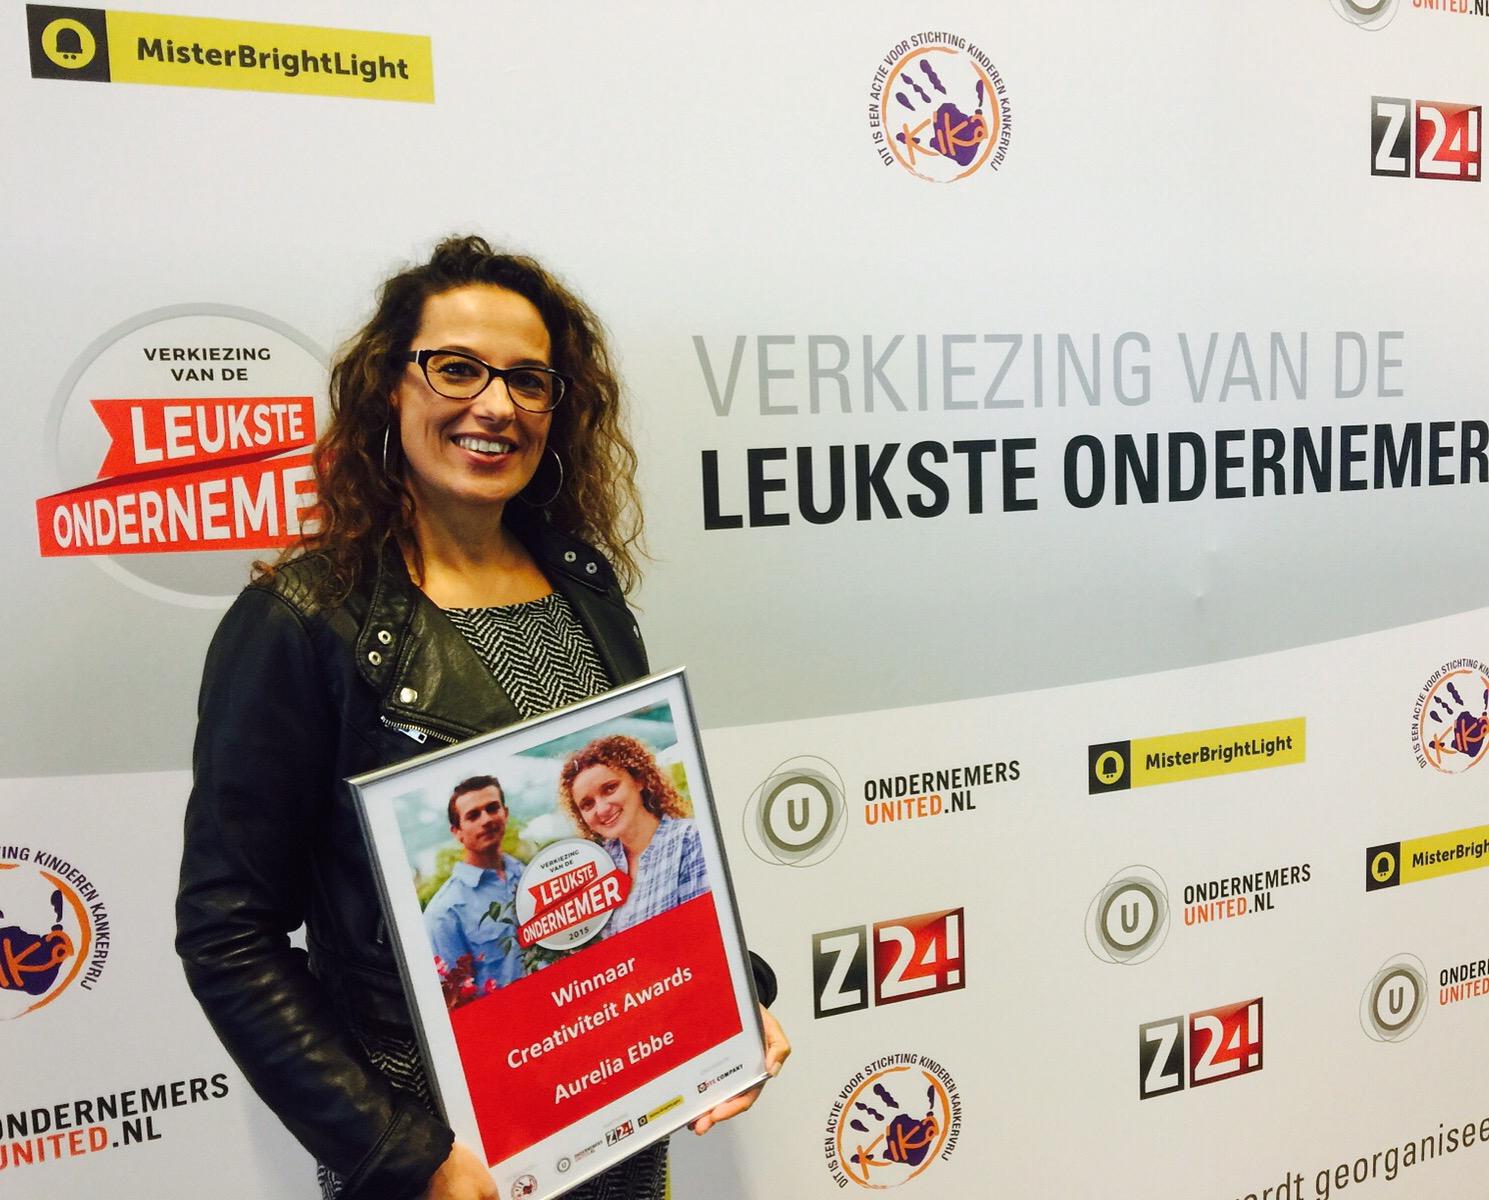 Aurelia Ebbe Winnaar Landelijke Creativiteit Award 2015